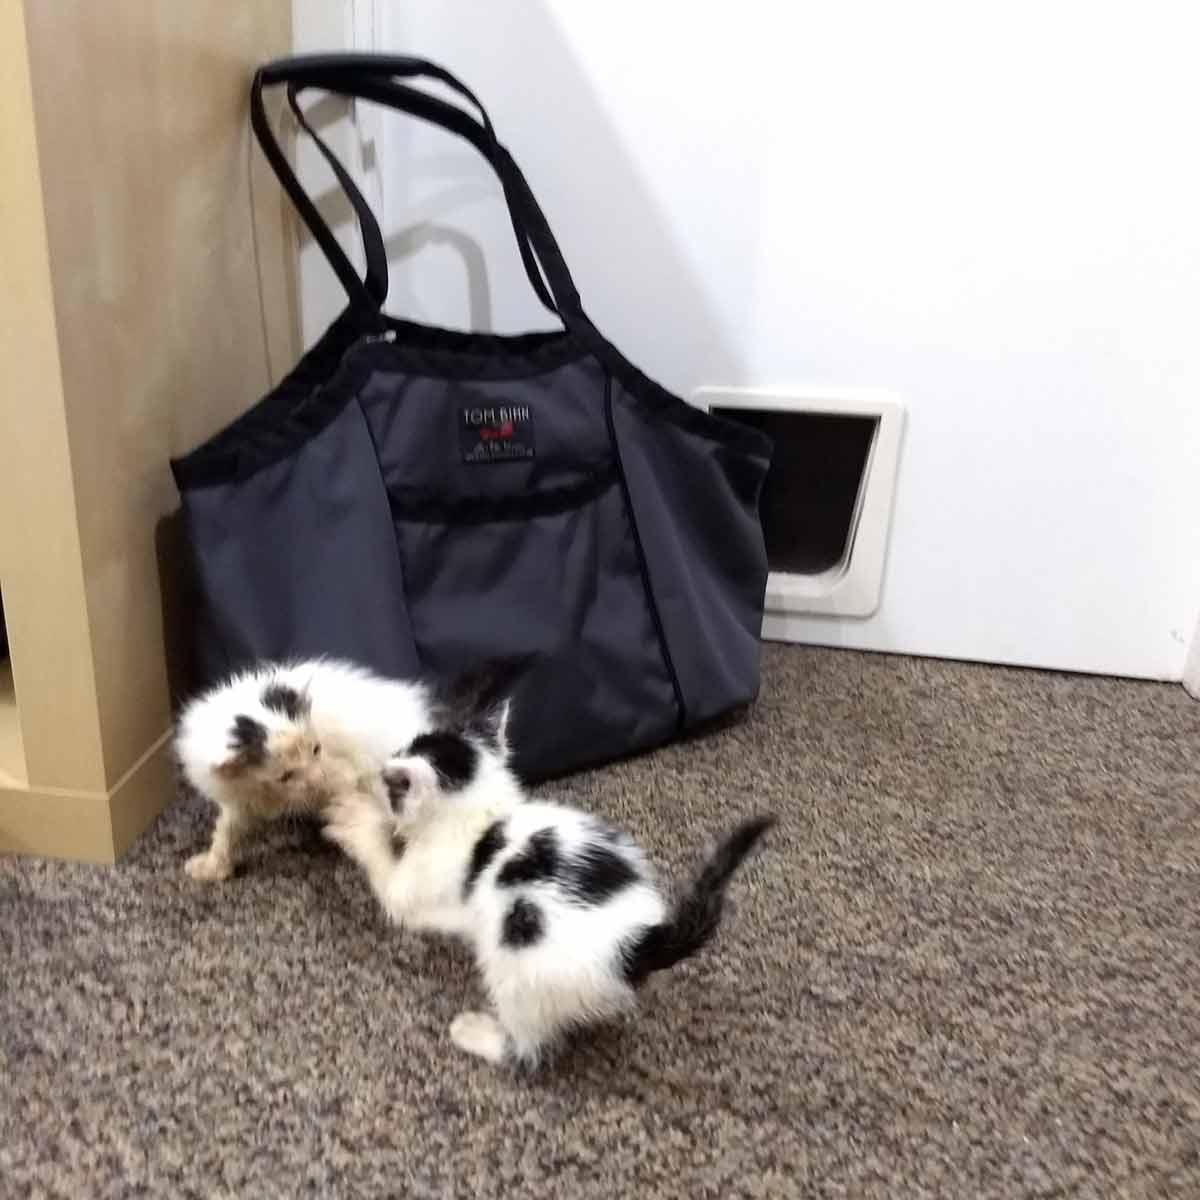 Black & White foster kittens ~6 weeks playing